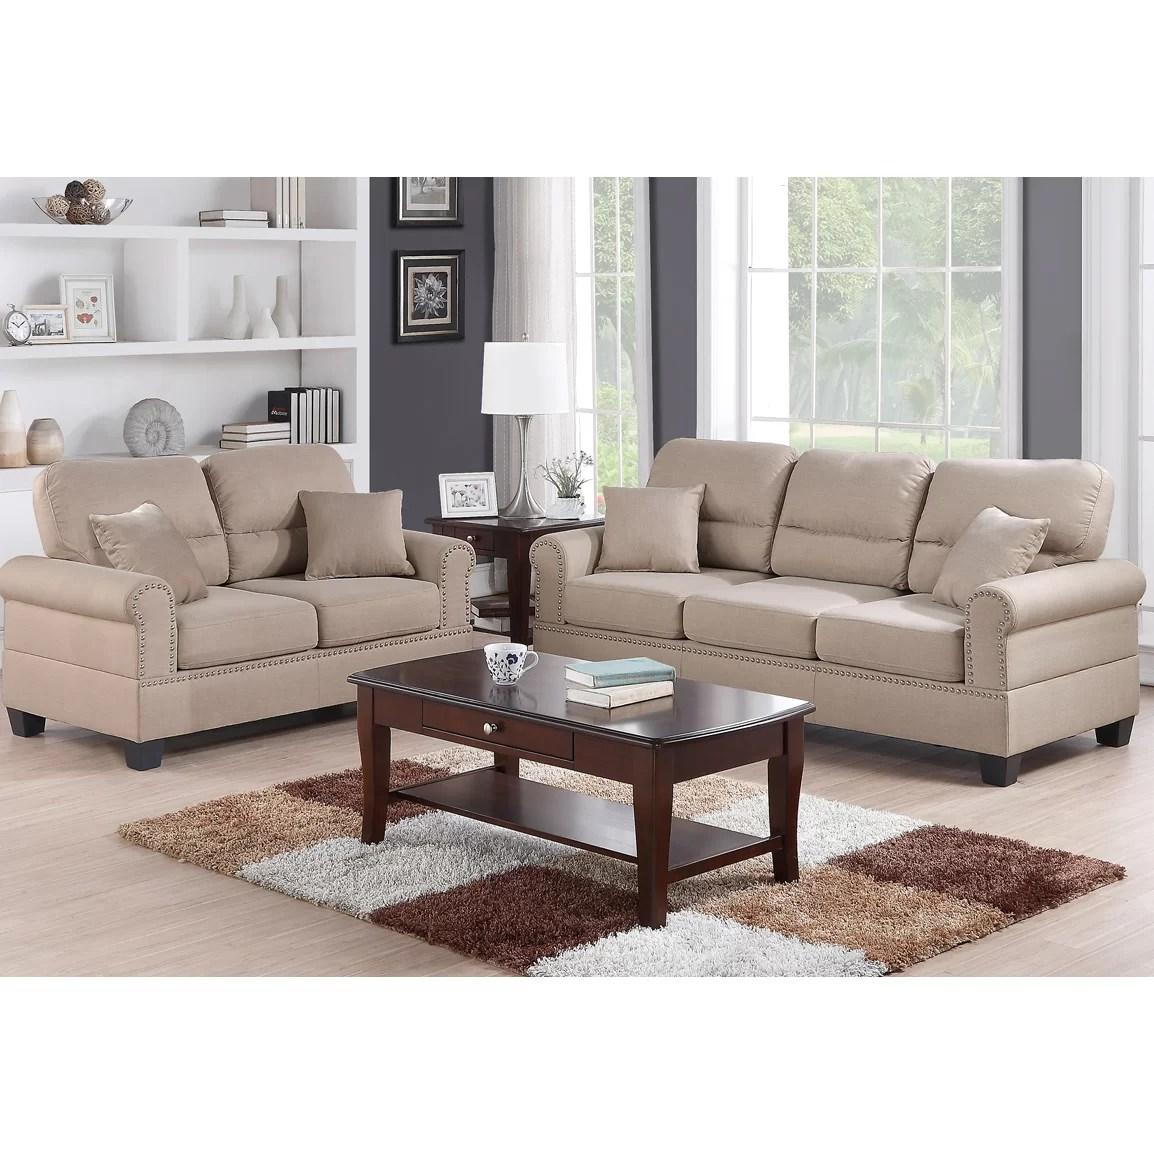 bobkona sofa set big pillows for sofas poundex shelton and loveseat reviews